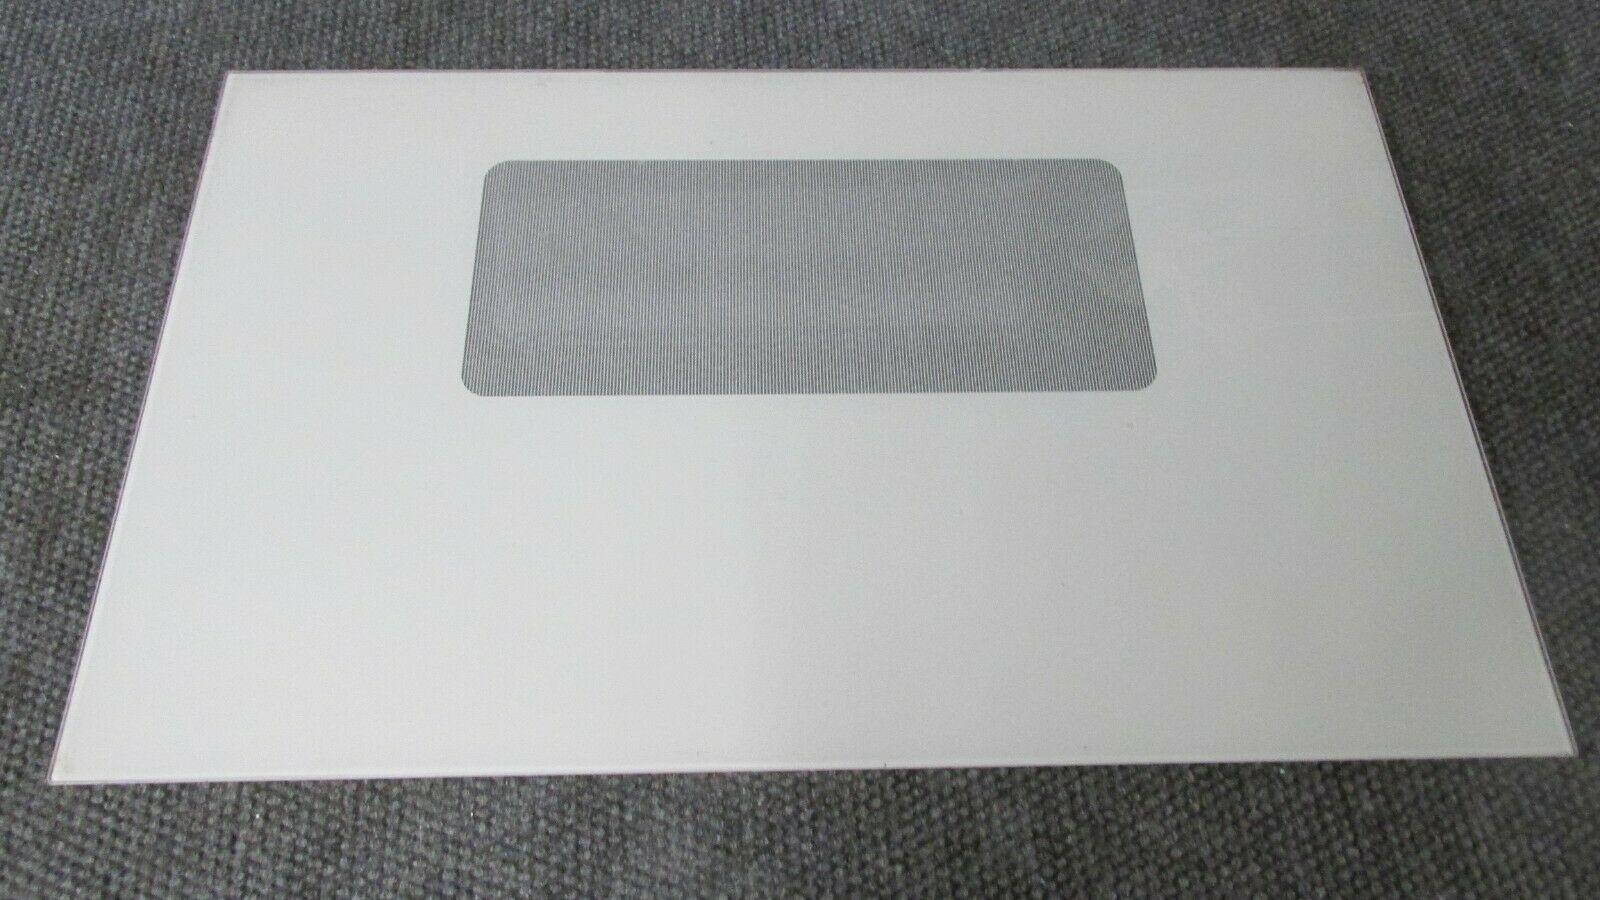 "74005041 Magic Chef Range Oven Outer Door Glass 29 1/8"" x 18 1/4""  - $100.00"